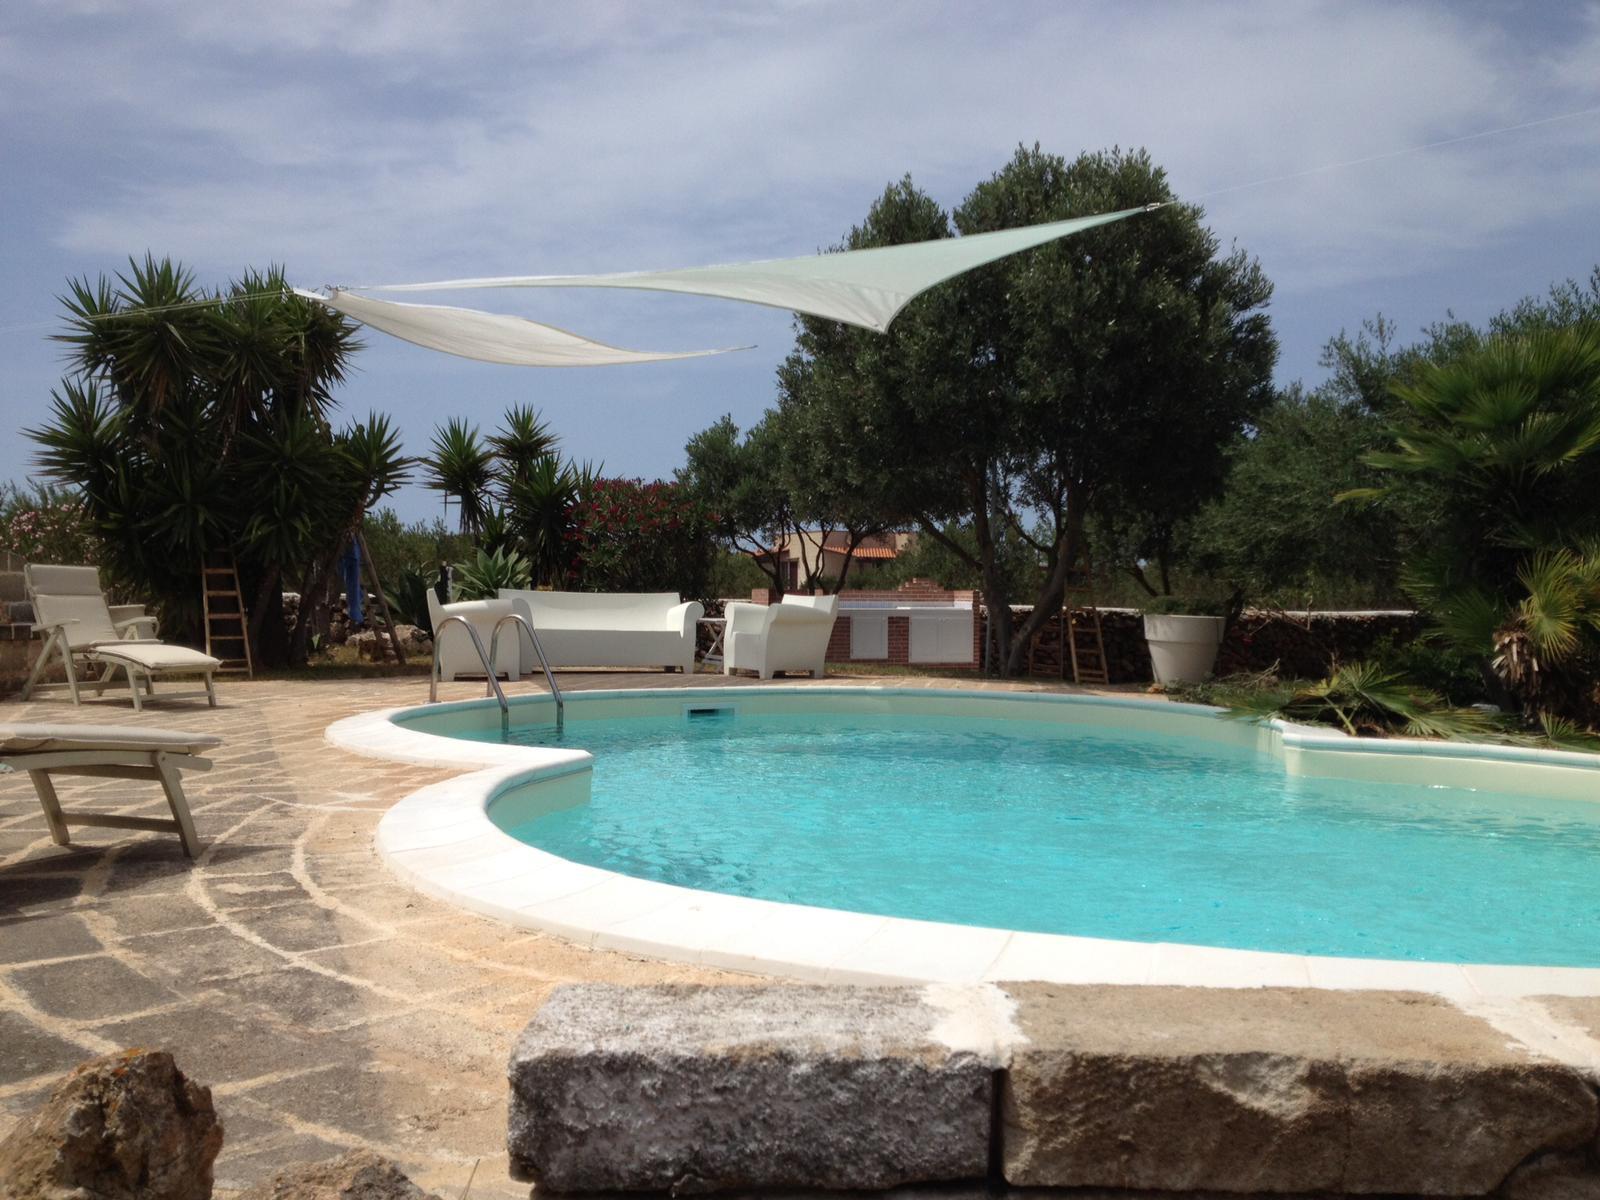 Stunning Villa with Swimming Pool on the island of Favignana, Sicily